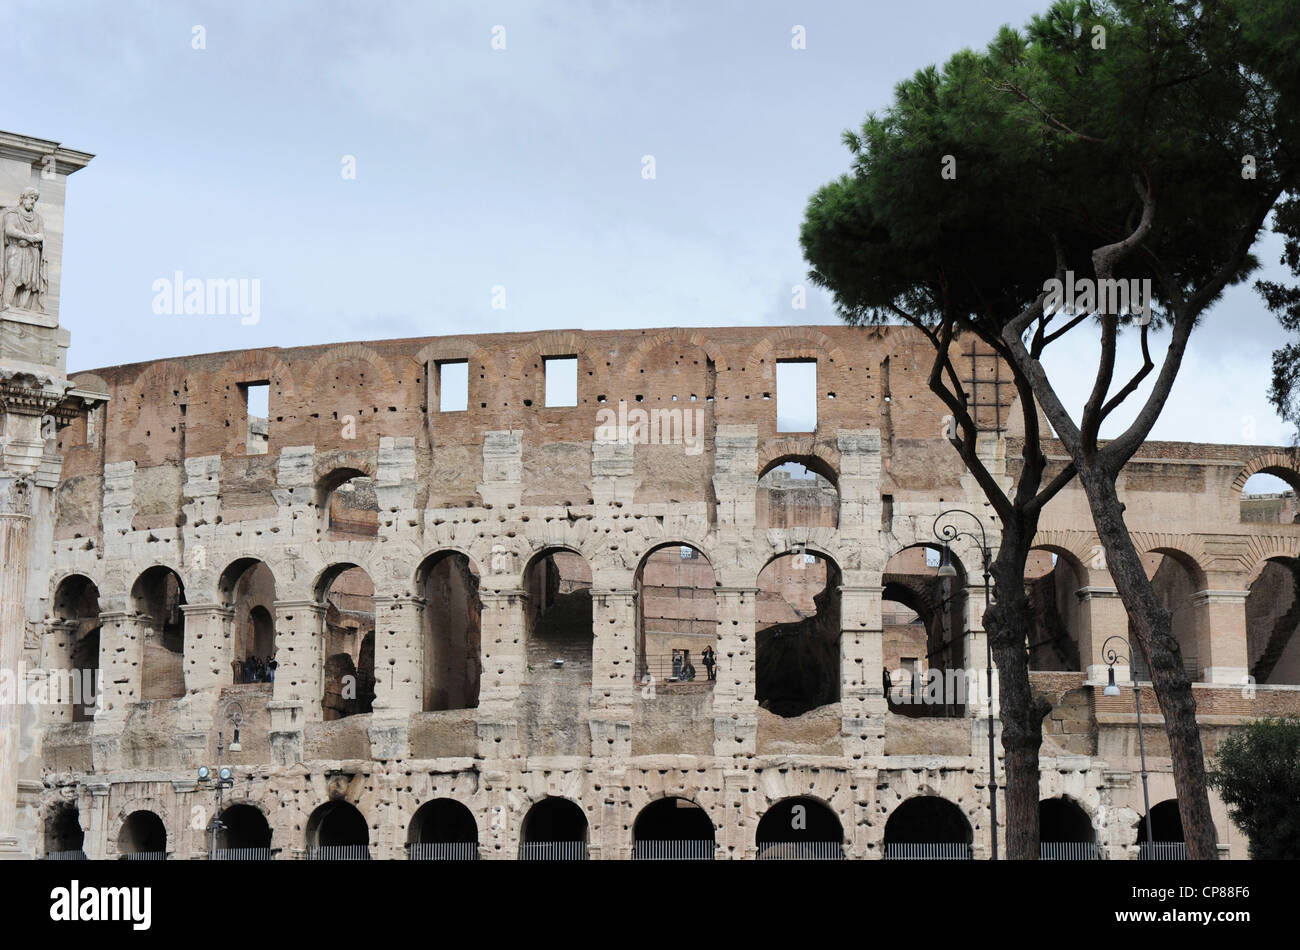 Colosseum Rome, Italy Stock Photo